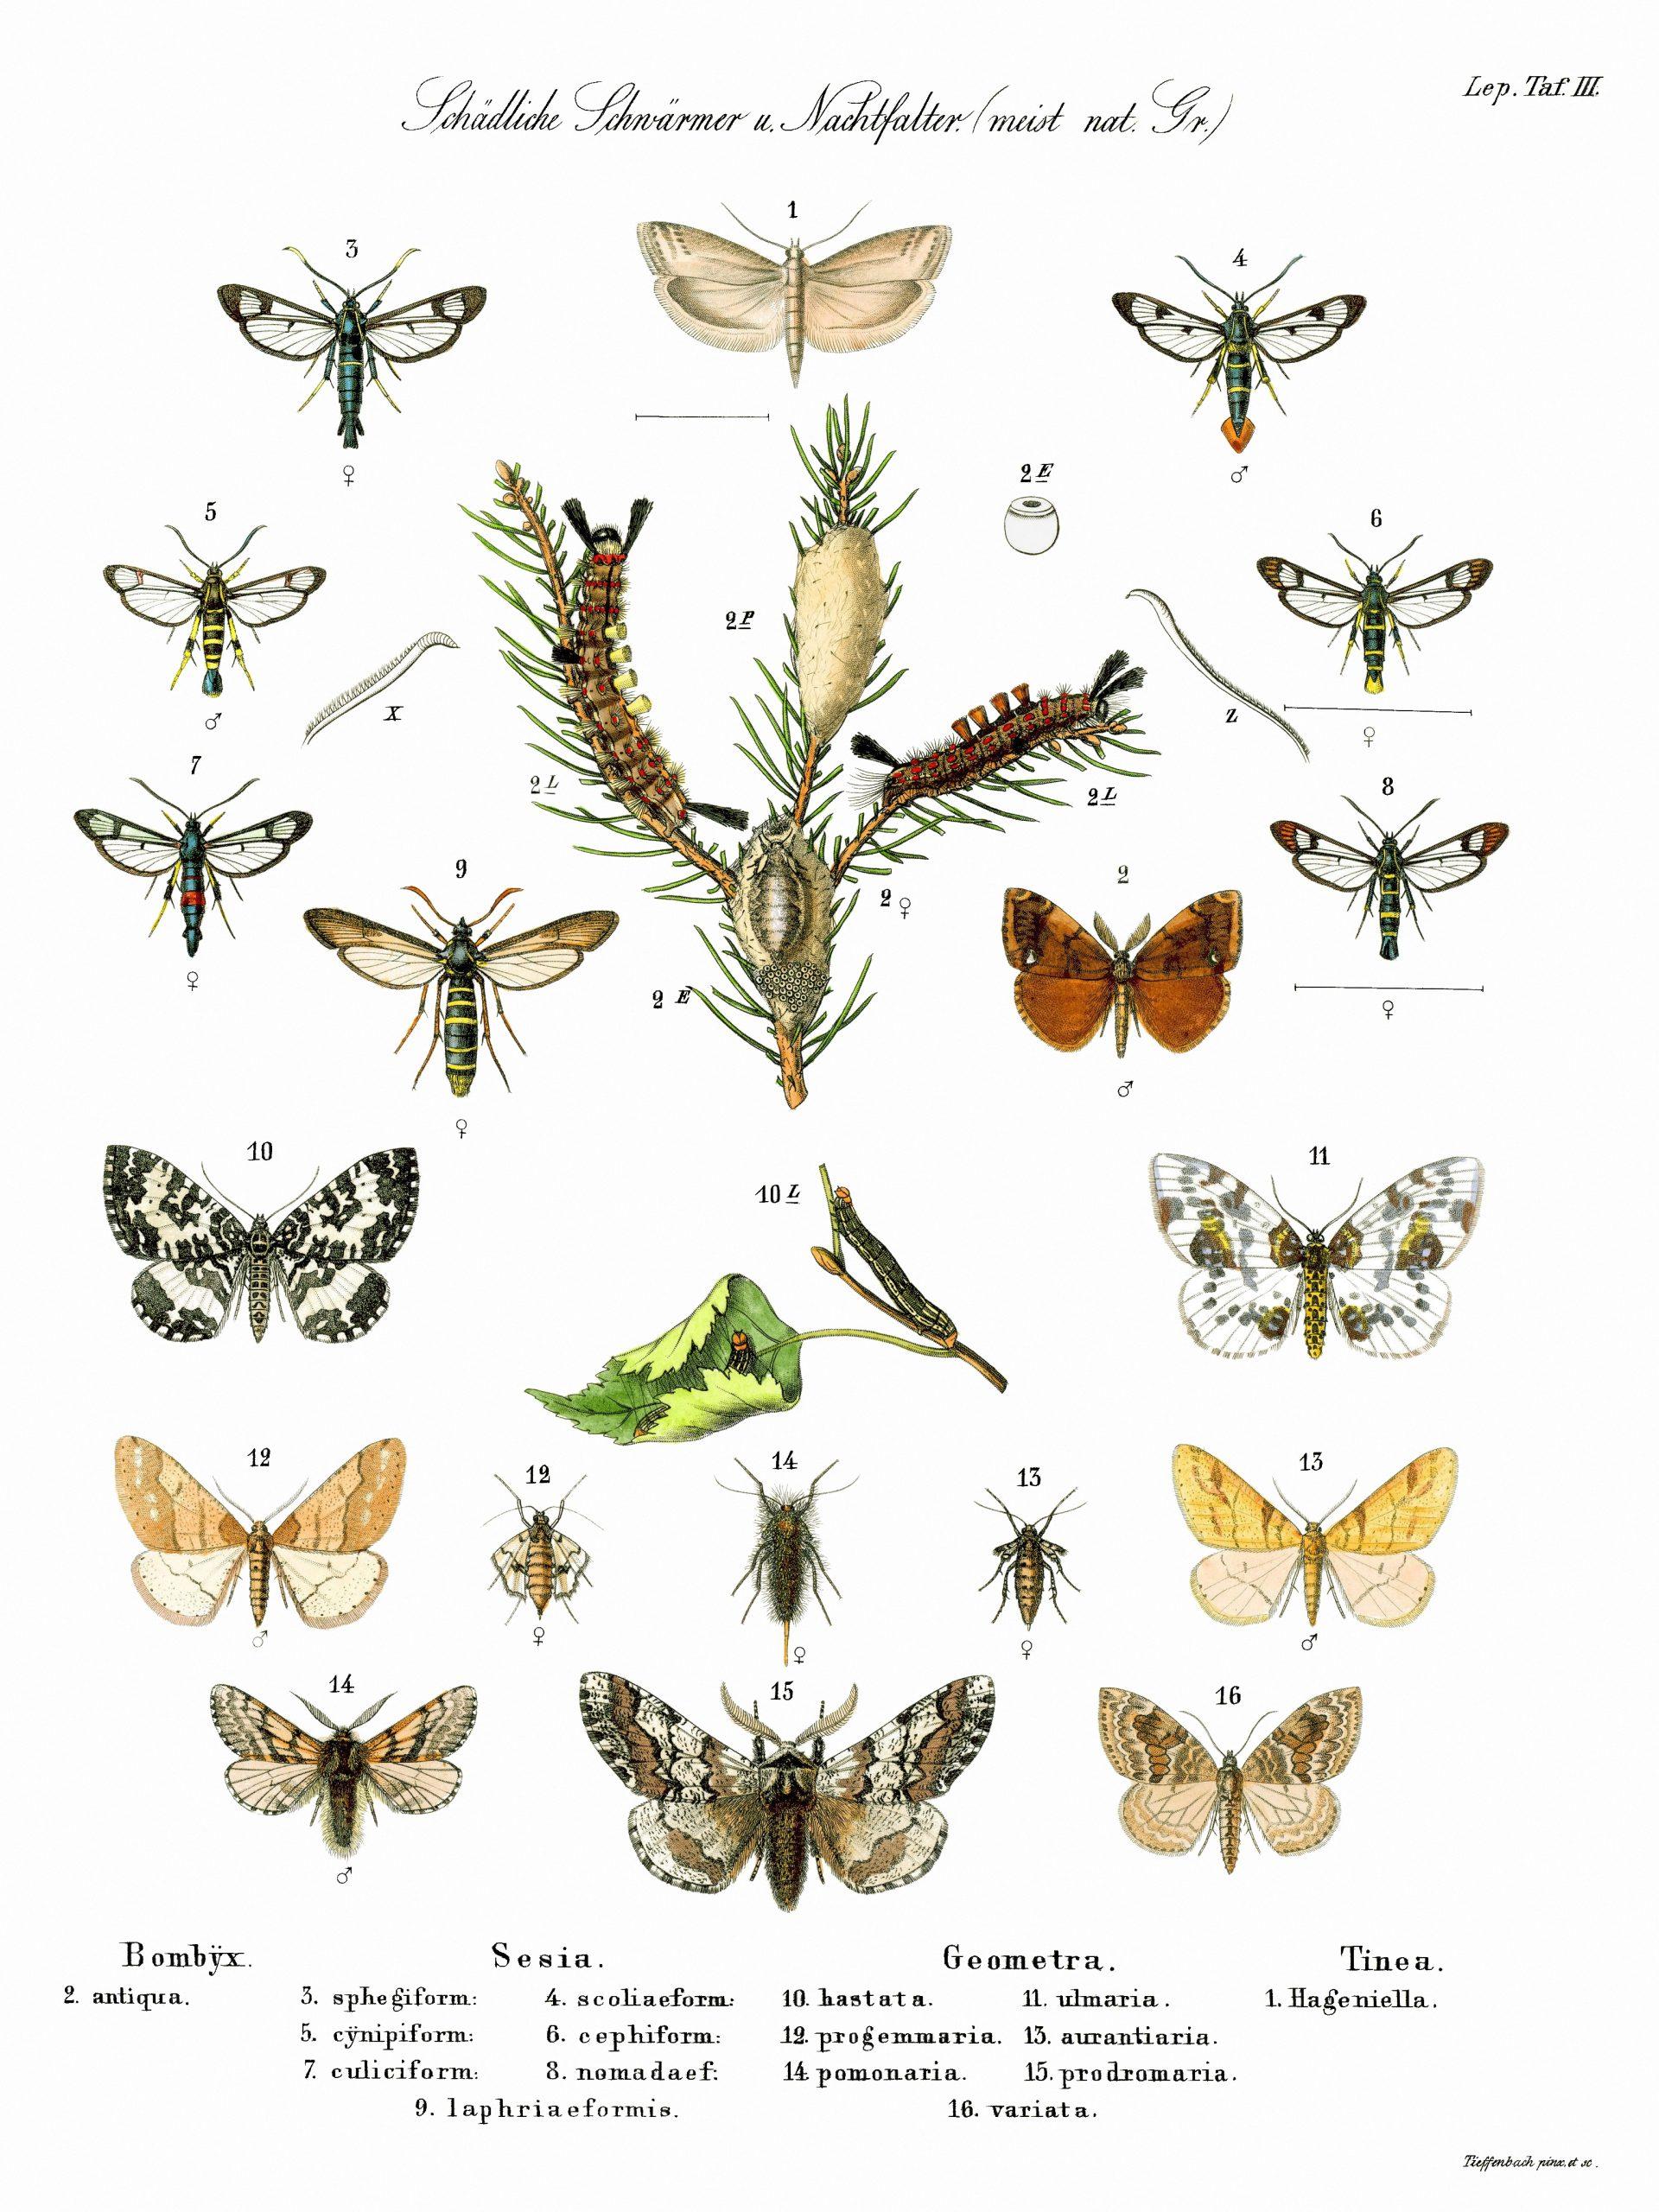 Schmetterlinge – Wikipedia bestimmt für Schmetterling Insekt